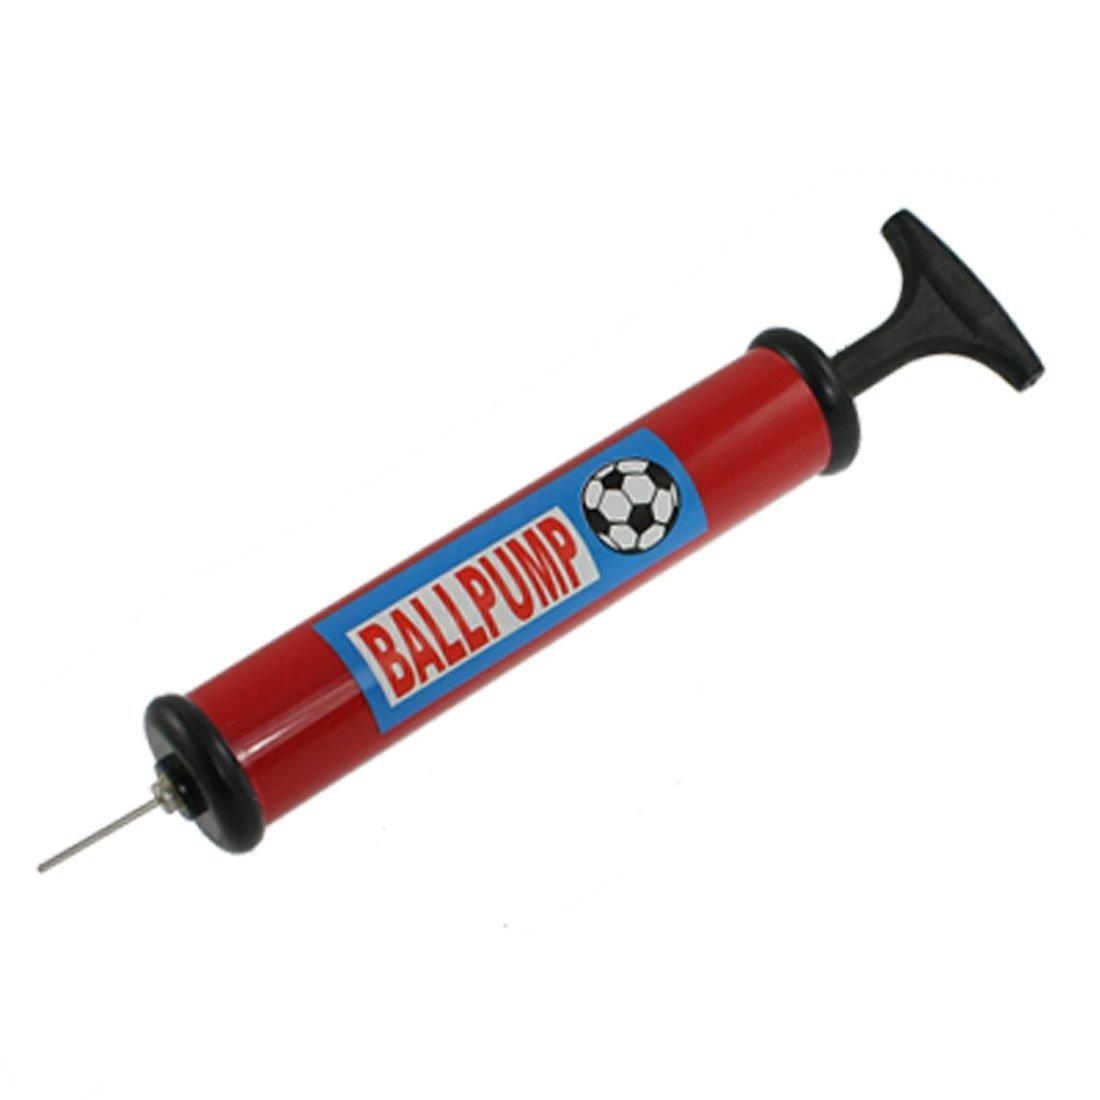 TOOGOO(R) Plastic Handle Basketball Football Air Pump Inflator Black Red SHOMAGT20908